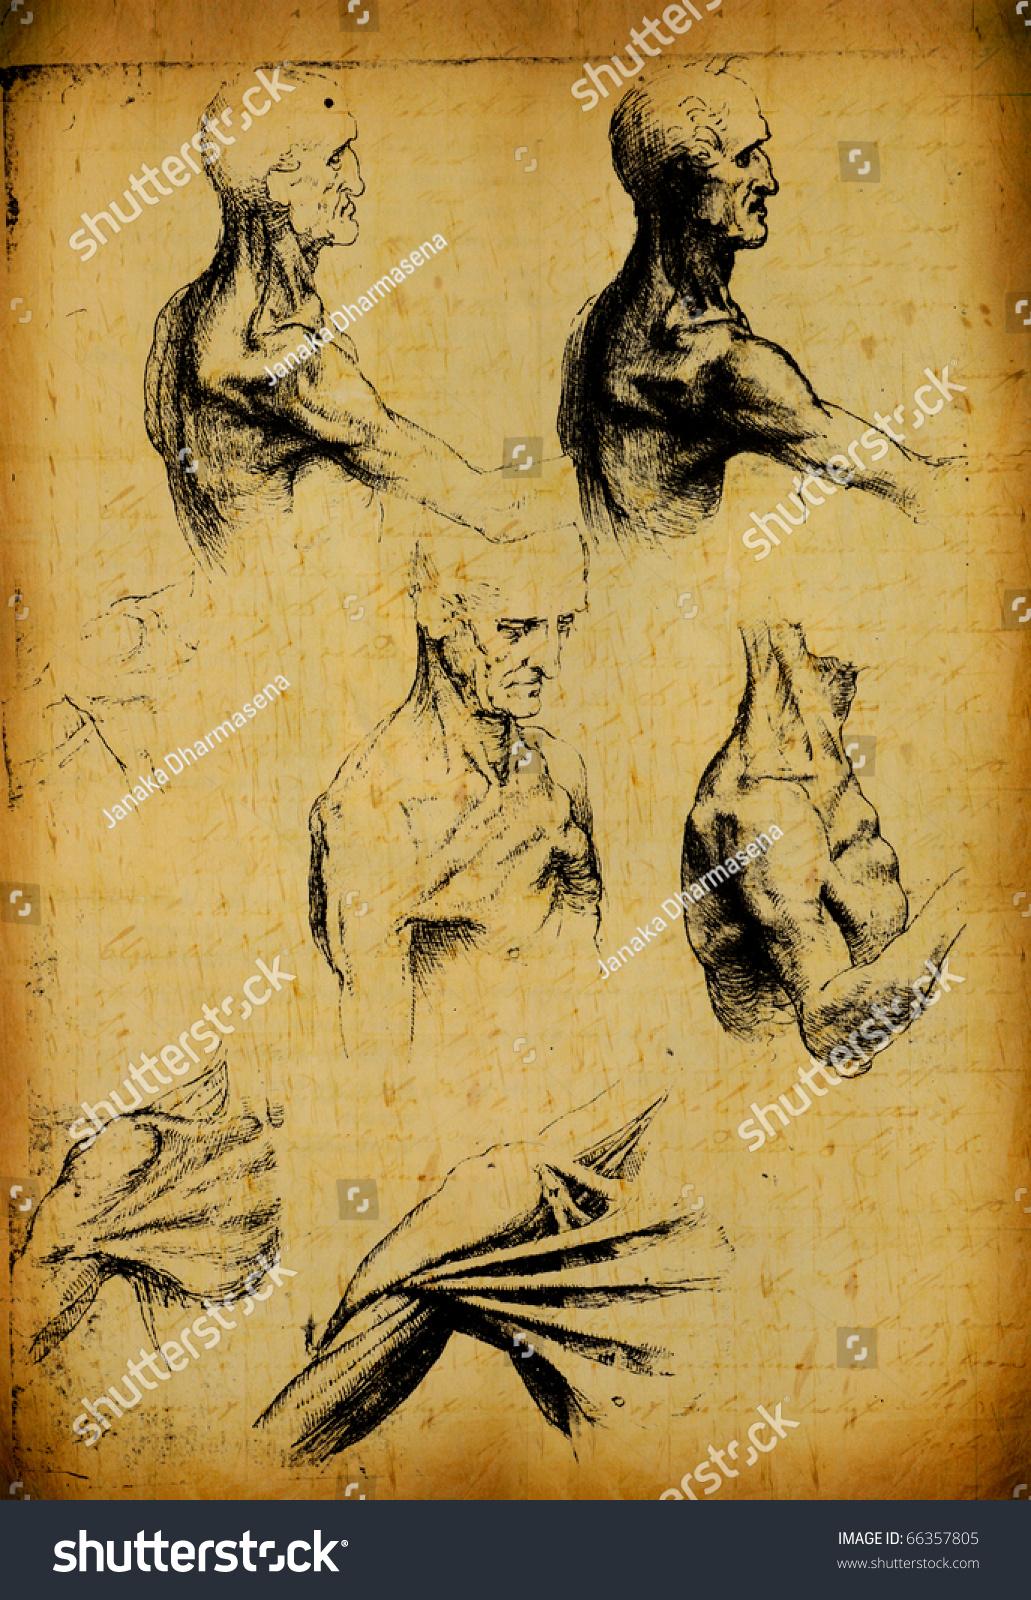 Anatomy Art By Leonardo Da Vinci Stock Illustration 66357805 ...